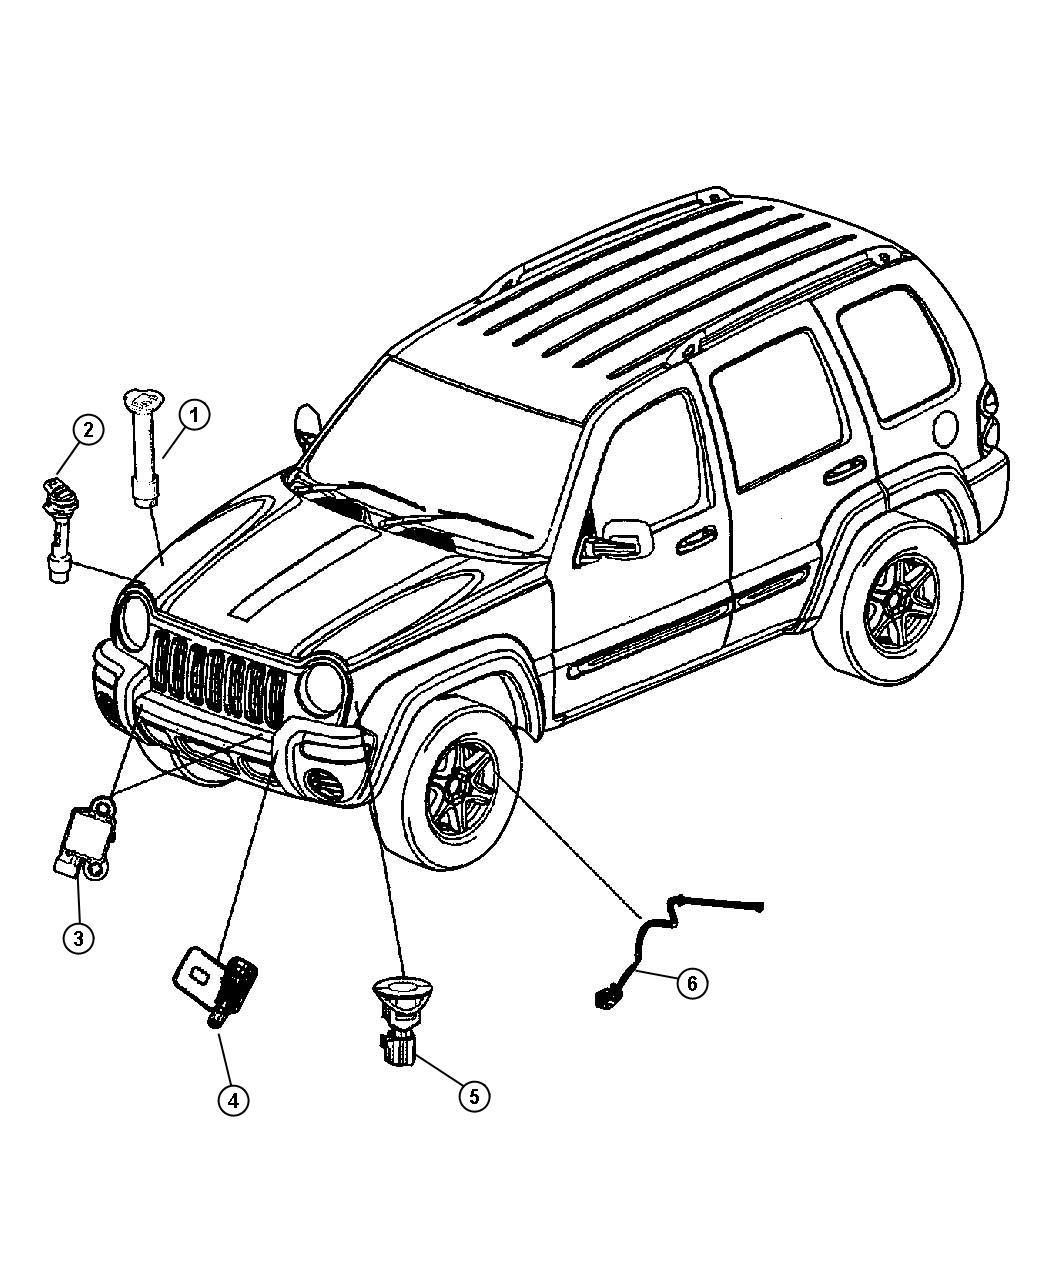 Wiring Diagram PDF: 2003 Jeep Liberty Fuse Box Location